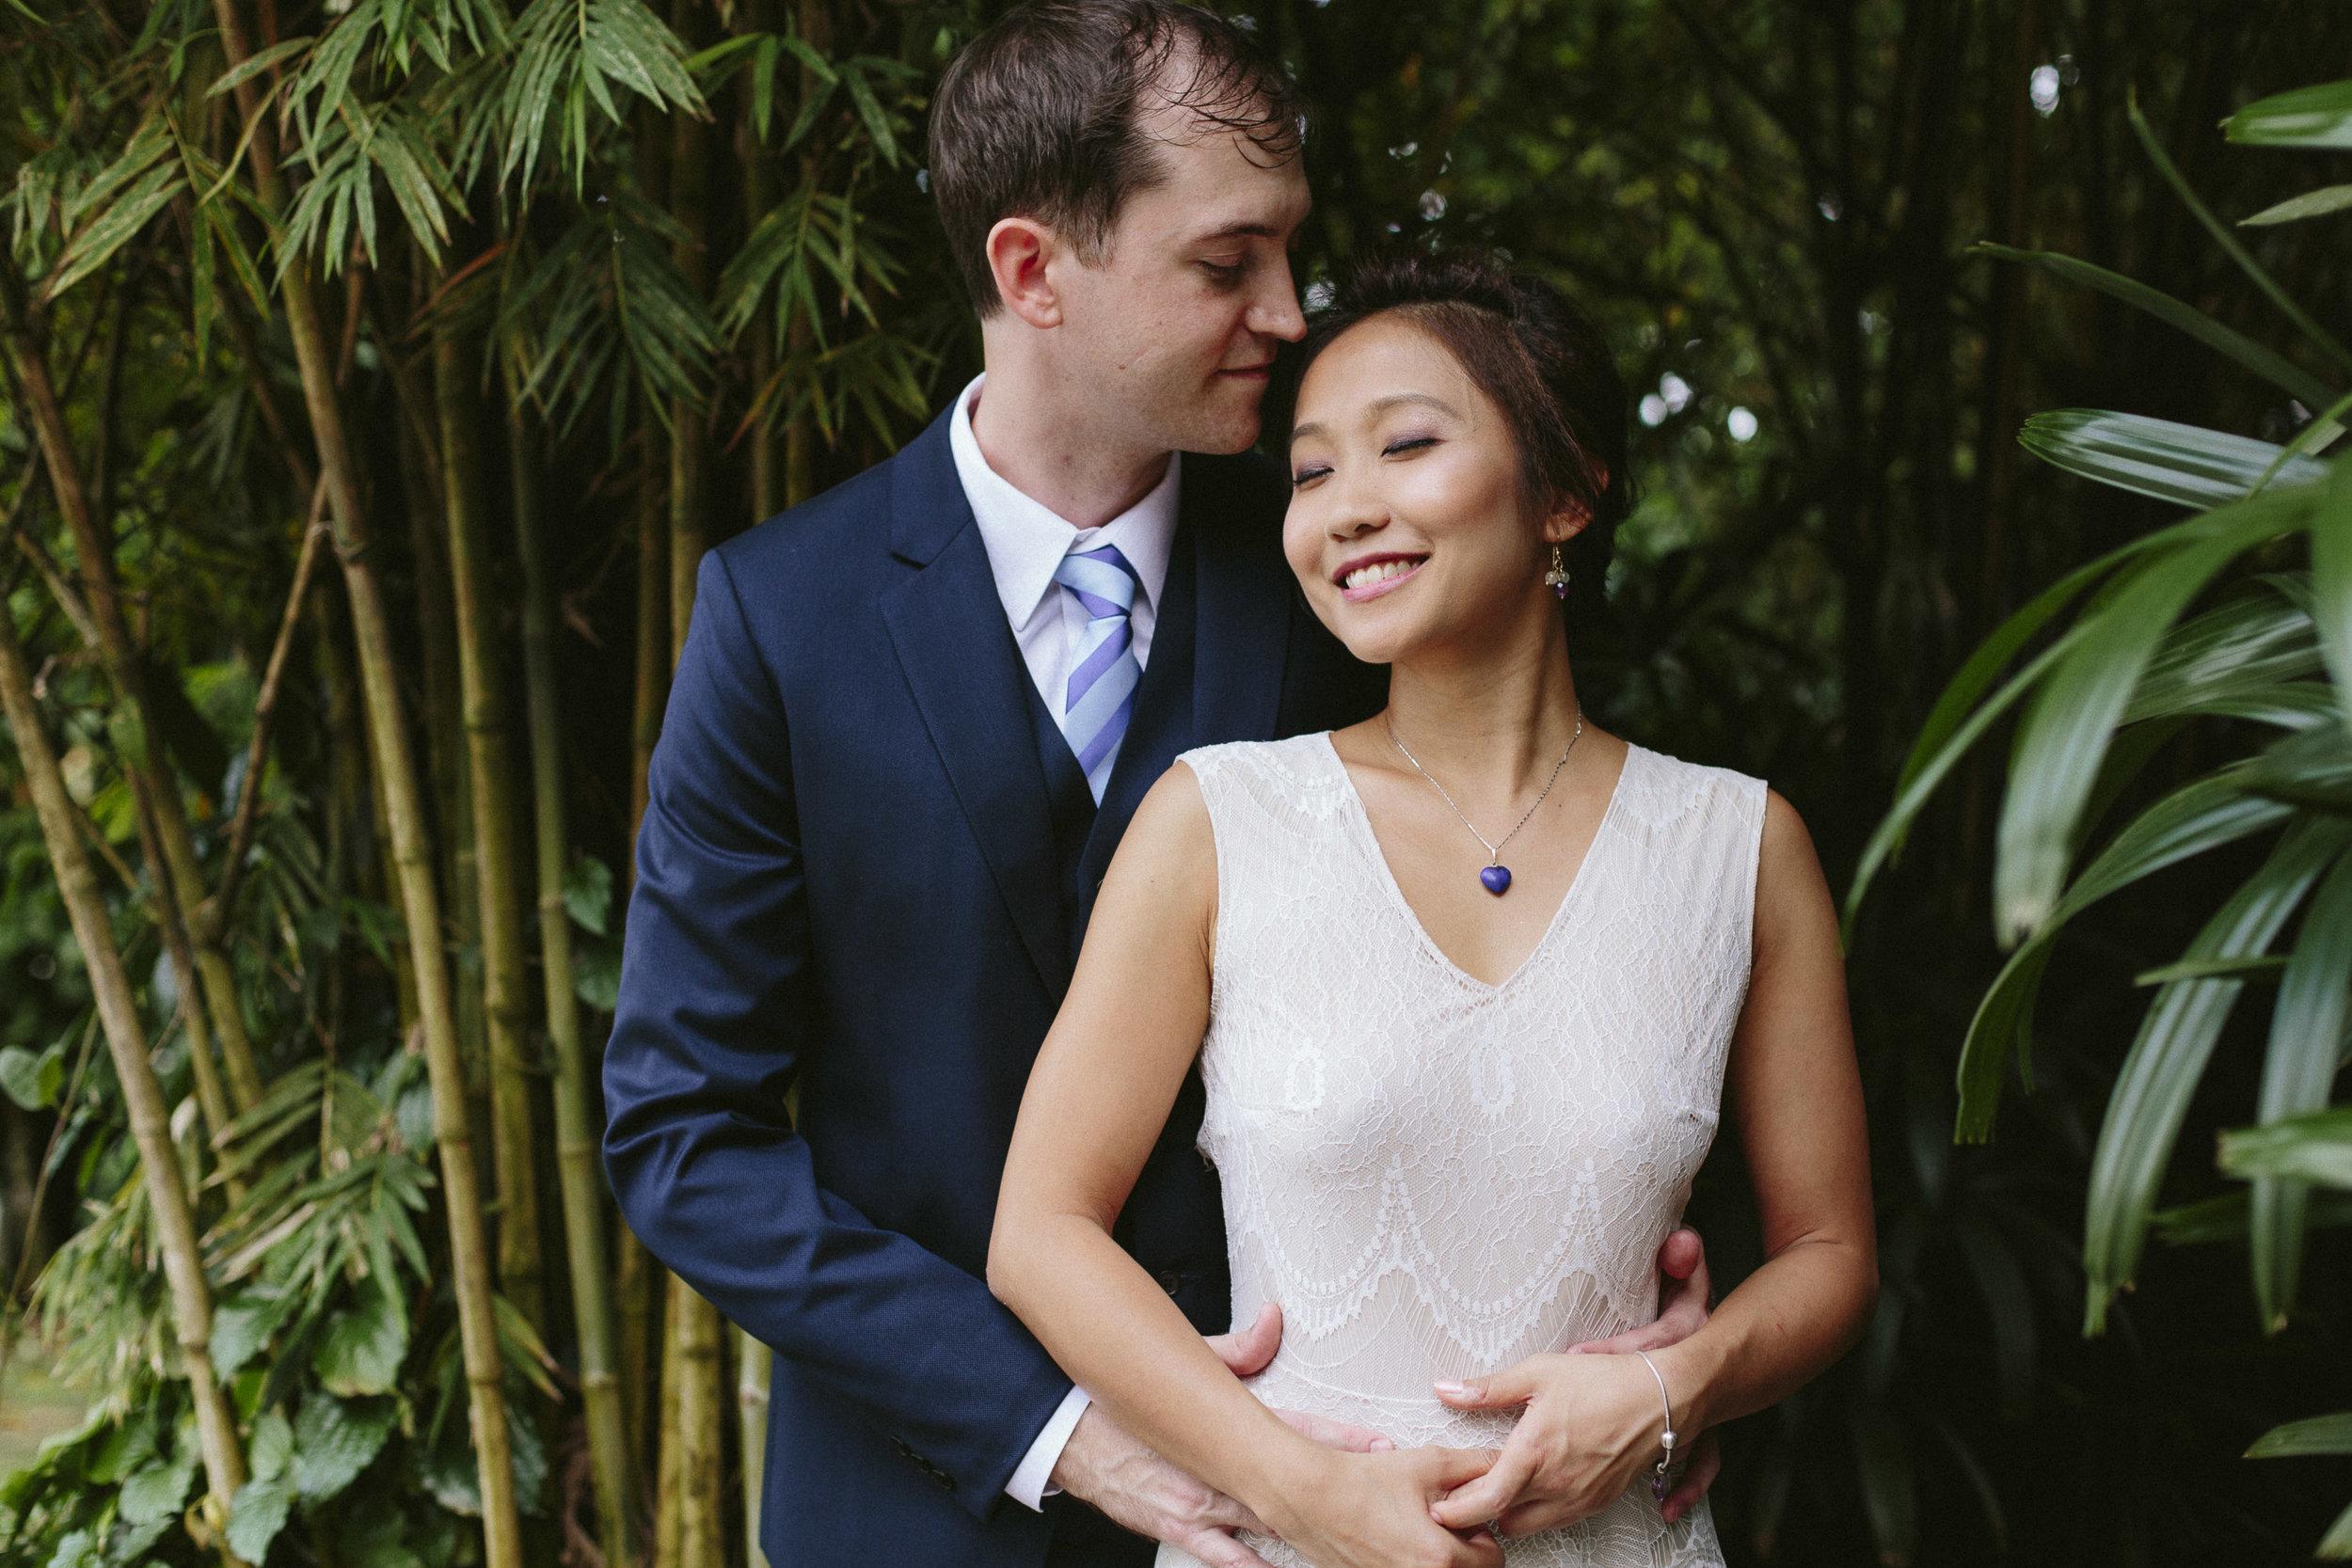 singapore-wedding-photographer-hiram-joyce-014.jpg